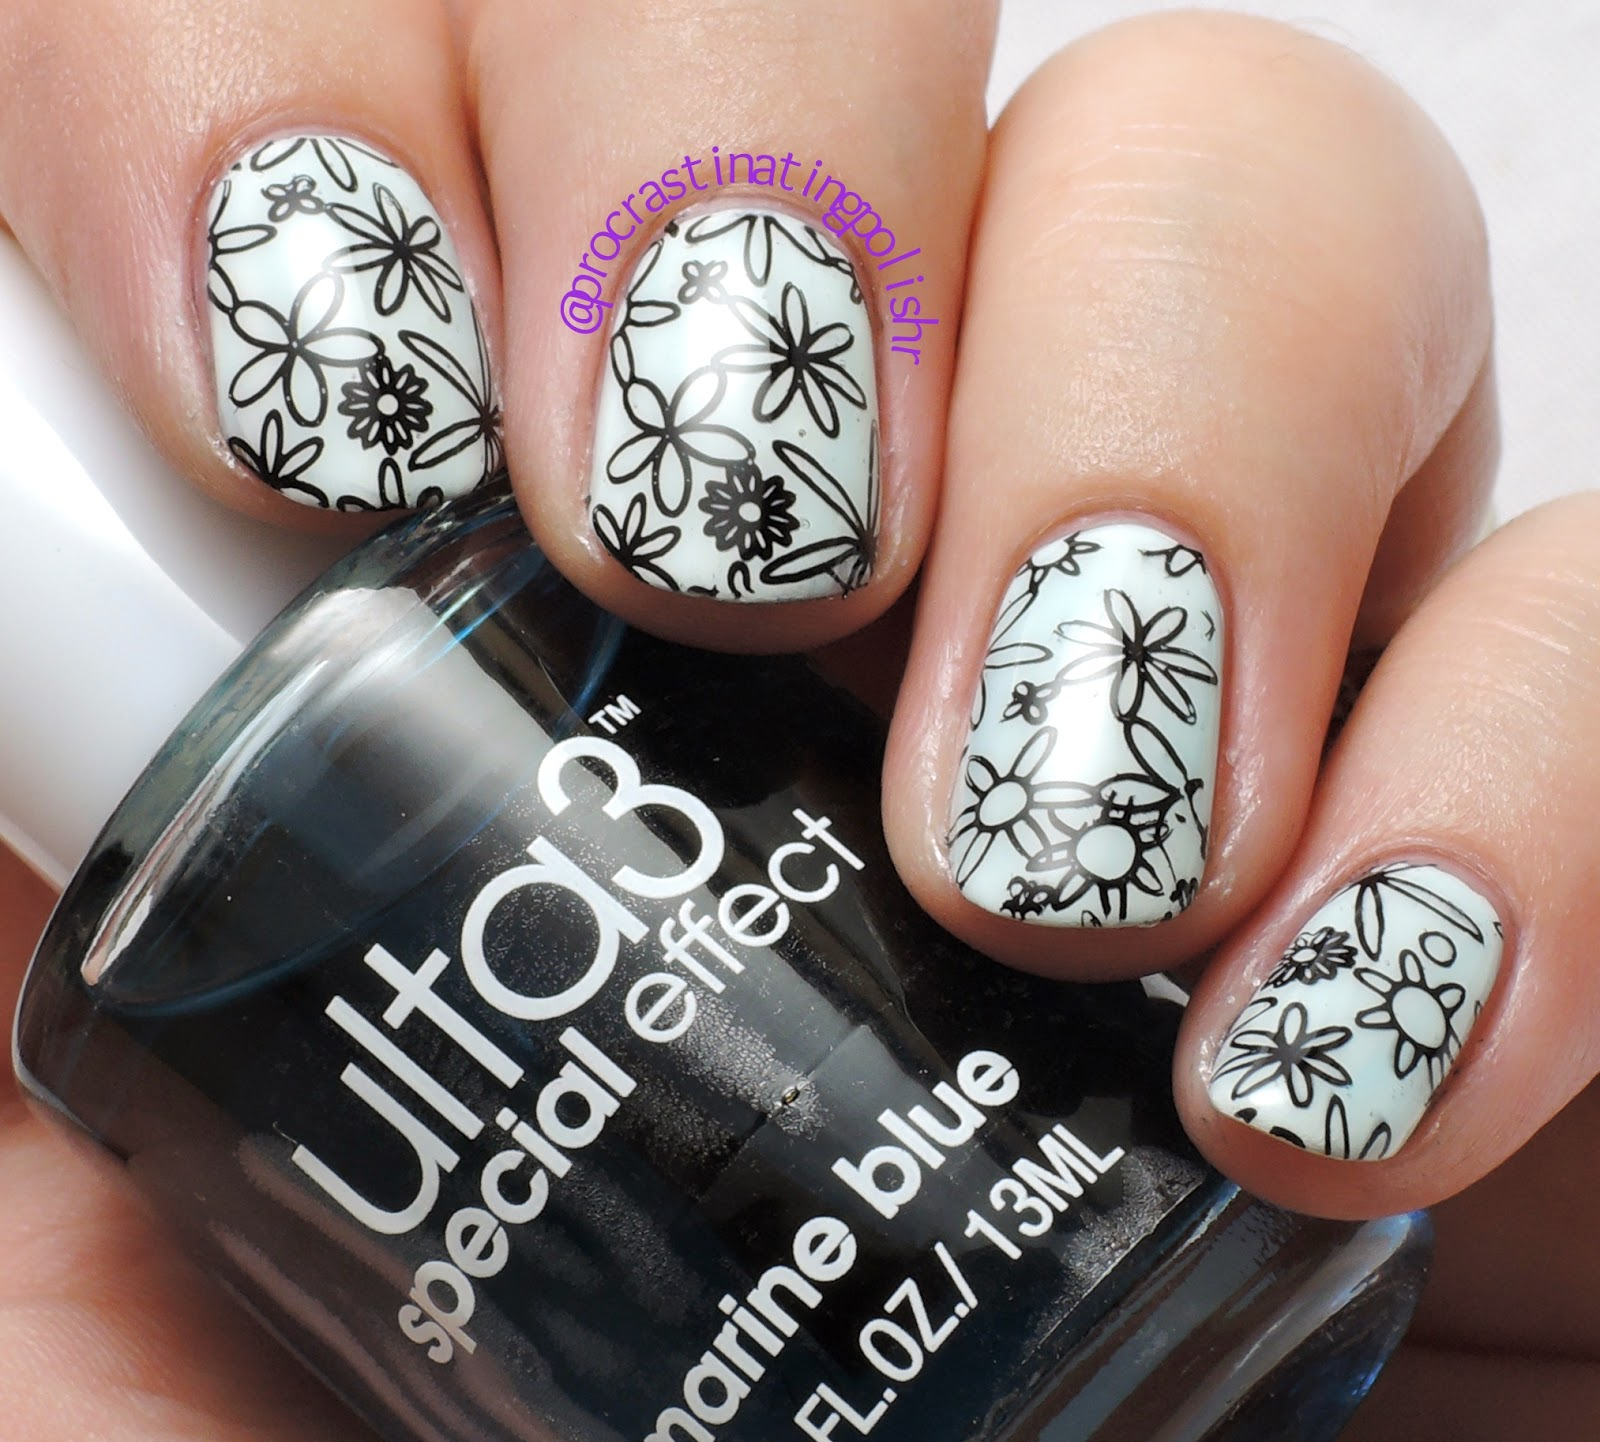 Floral stamping | Ulta3 Watercolour Marine Blue | Lilyanna 06